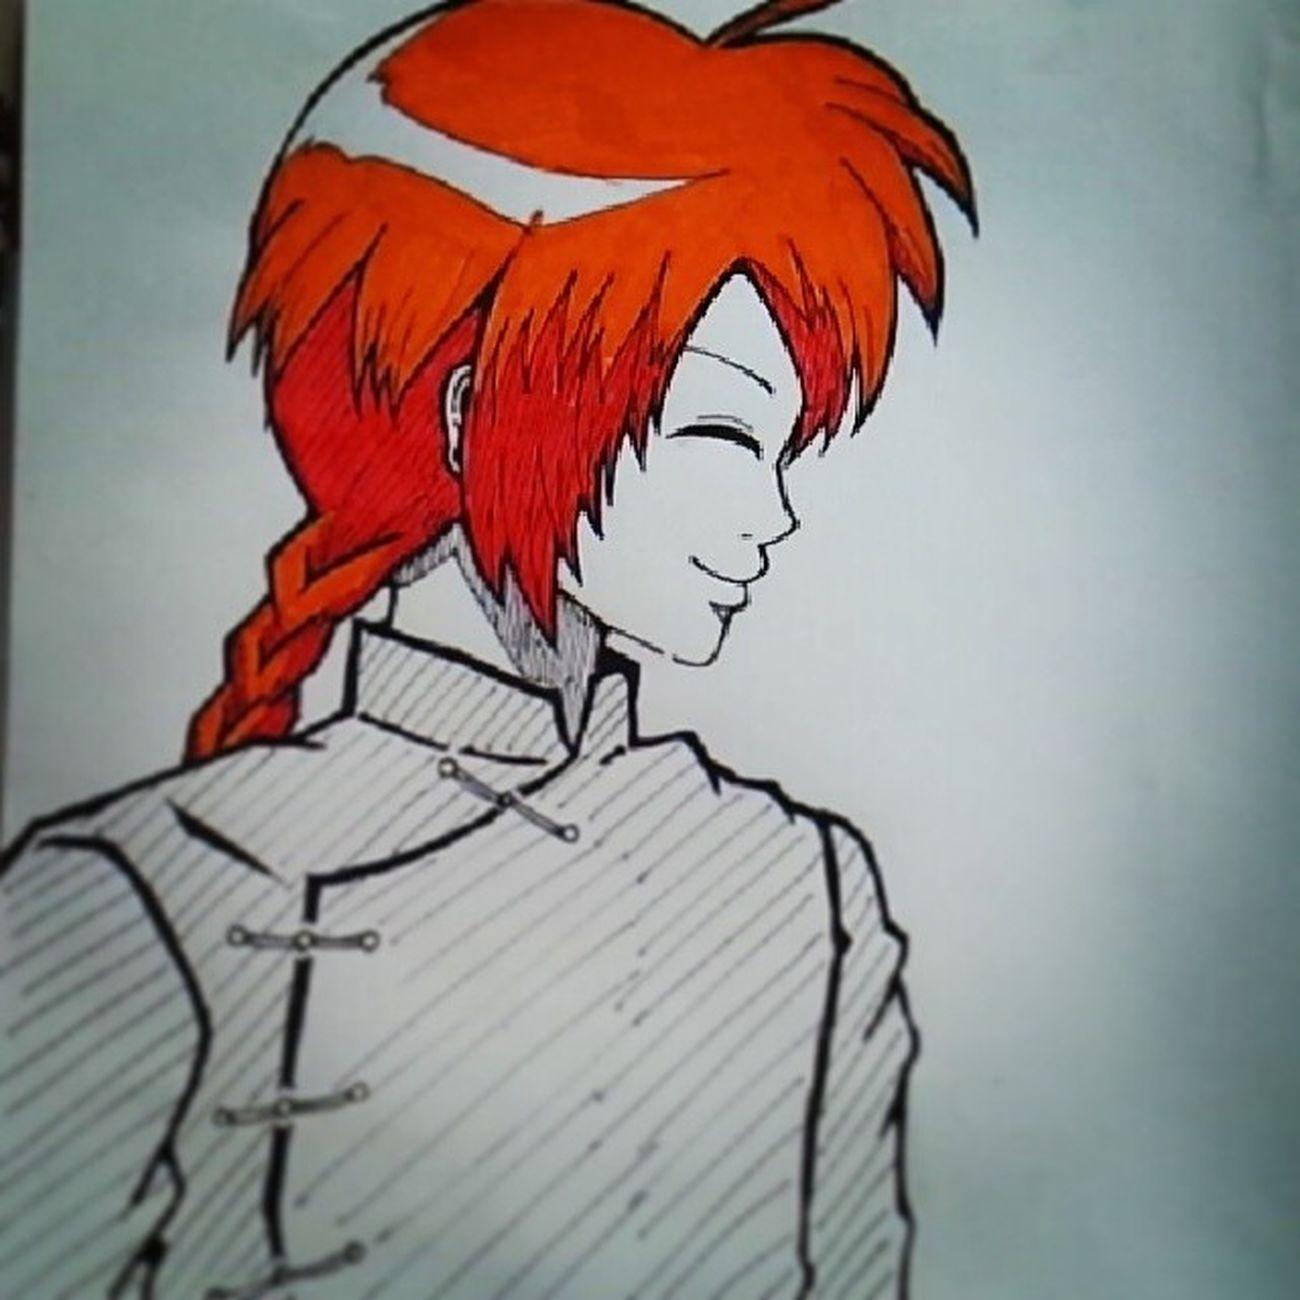 Anime Comic Gintama Kamui Illust 漫画 銀魂 神威 絵